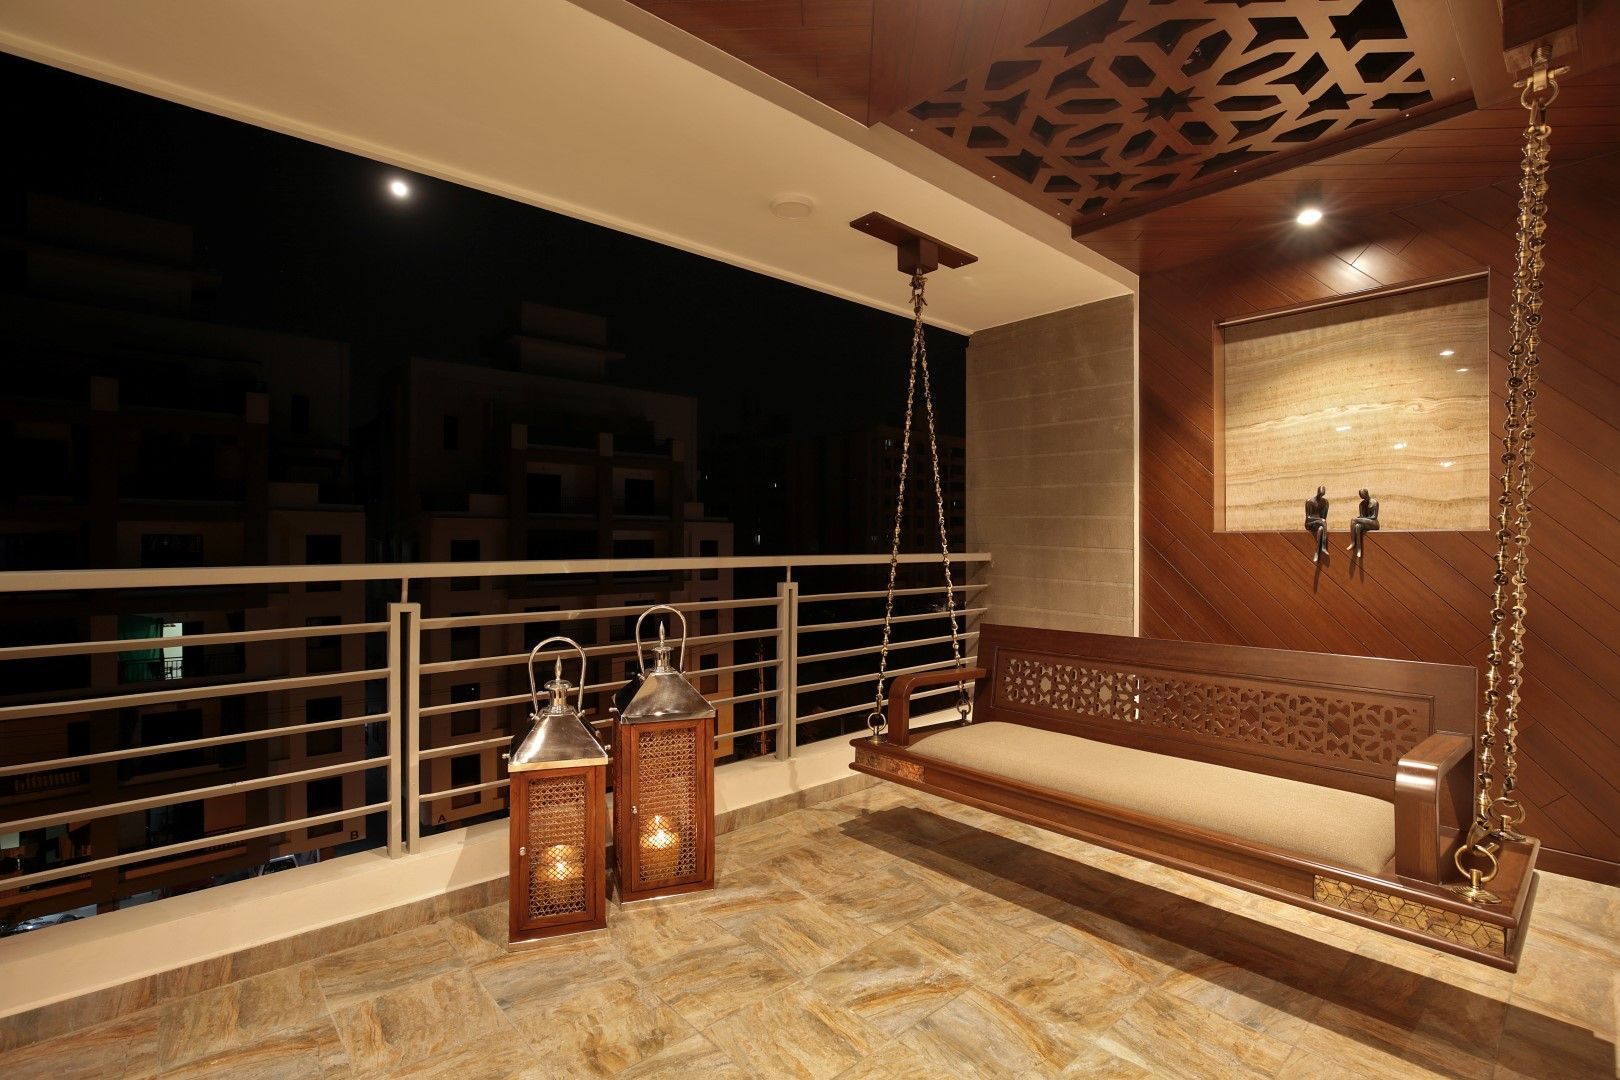 3 Bhk Flat Interiors The Oak Woods Vadodara Studio7 The